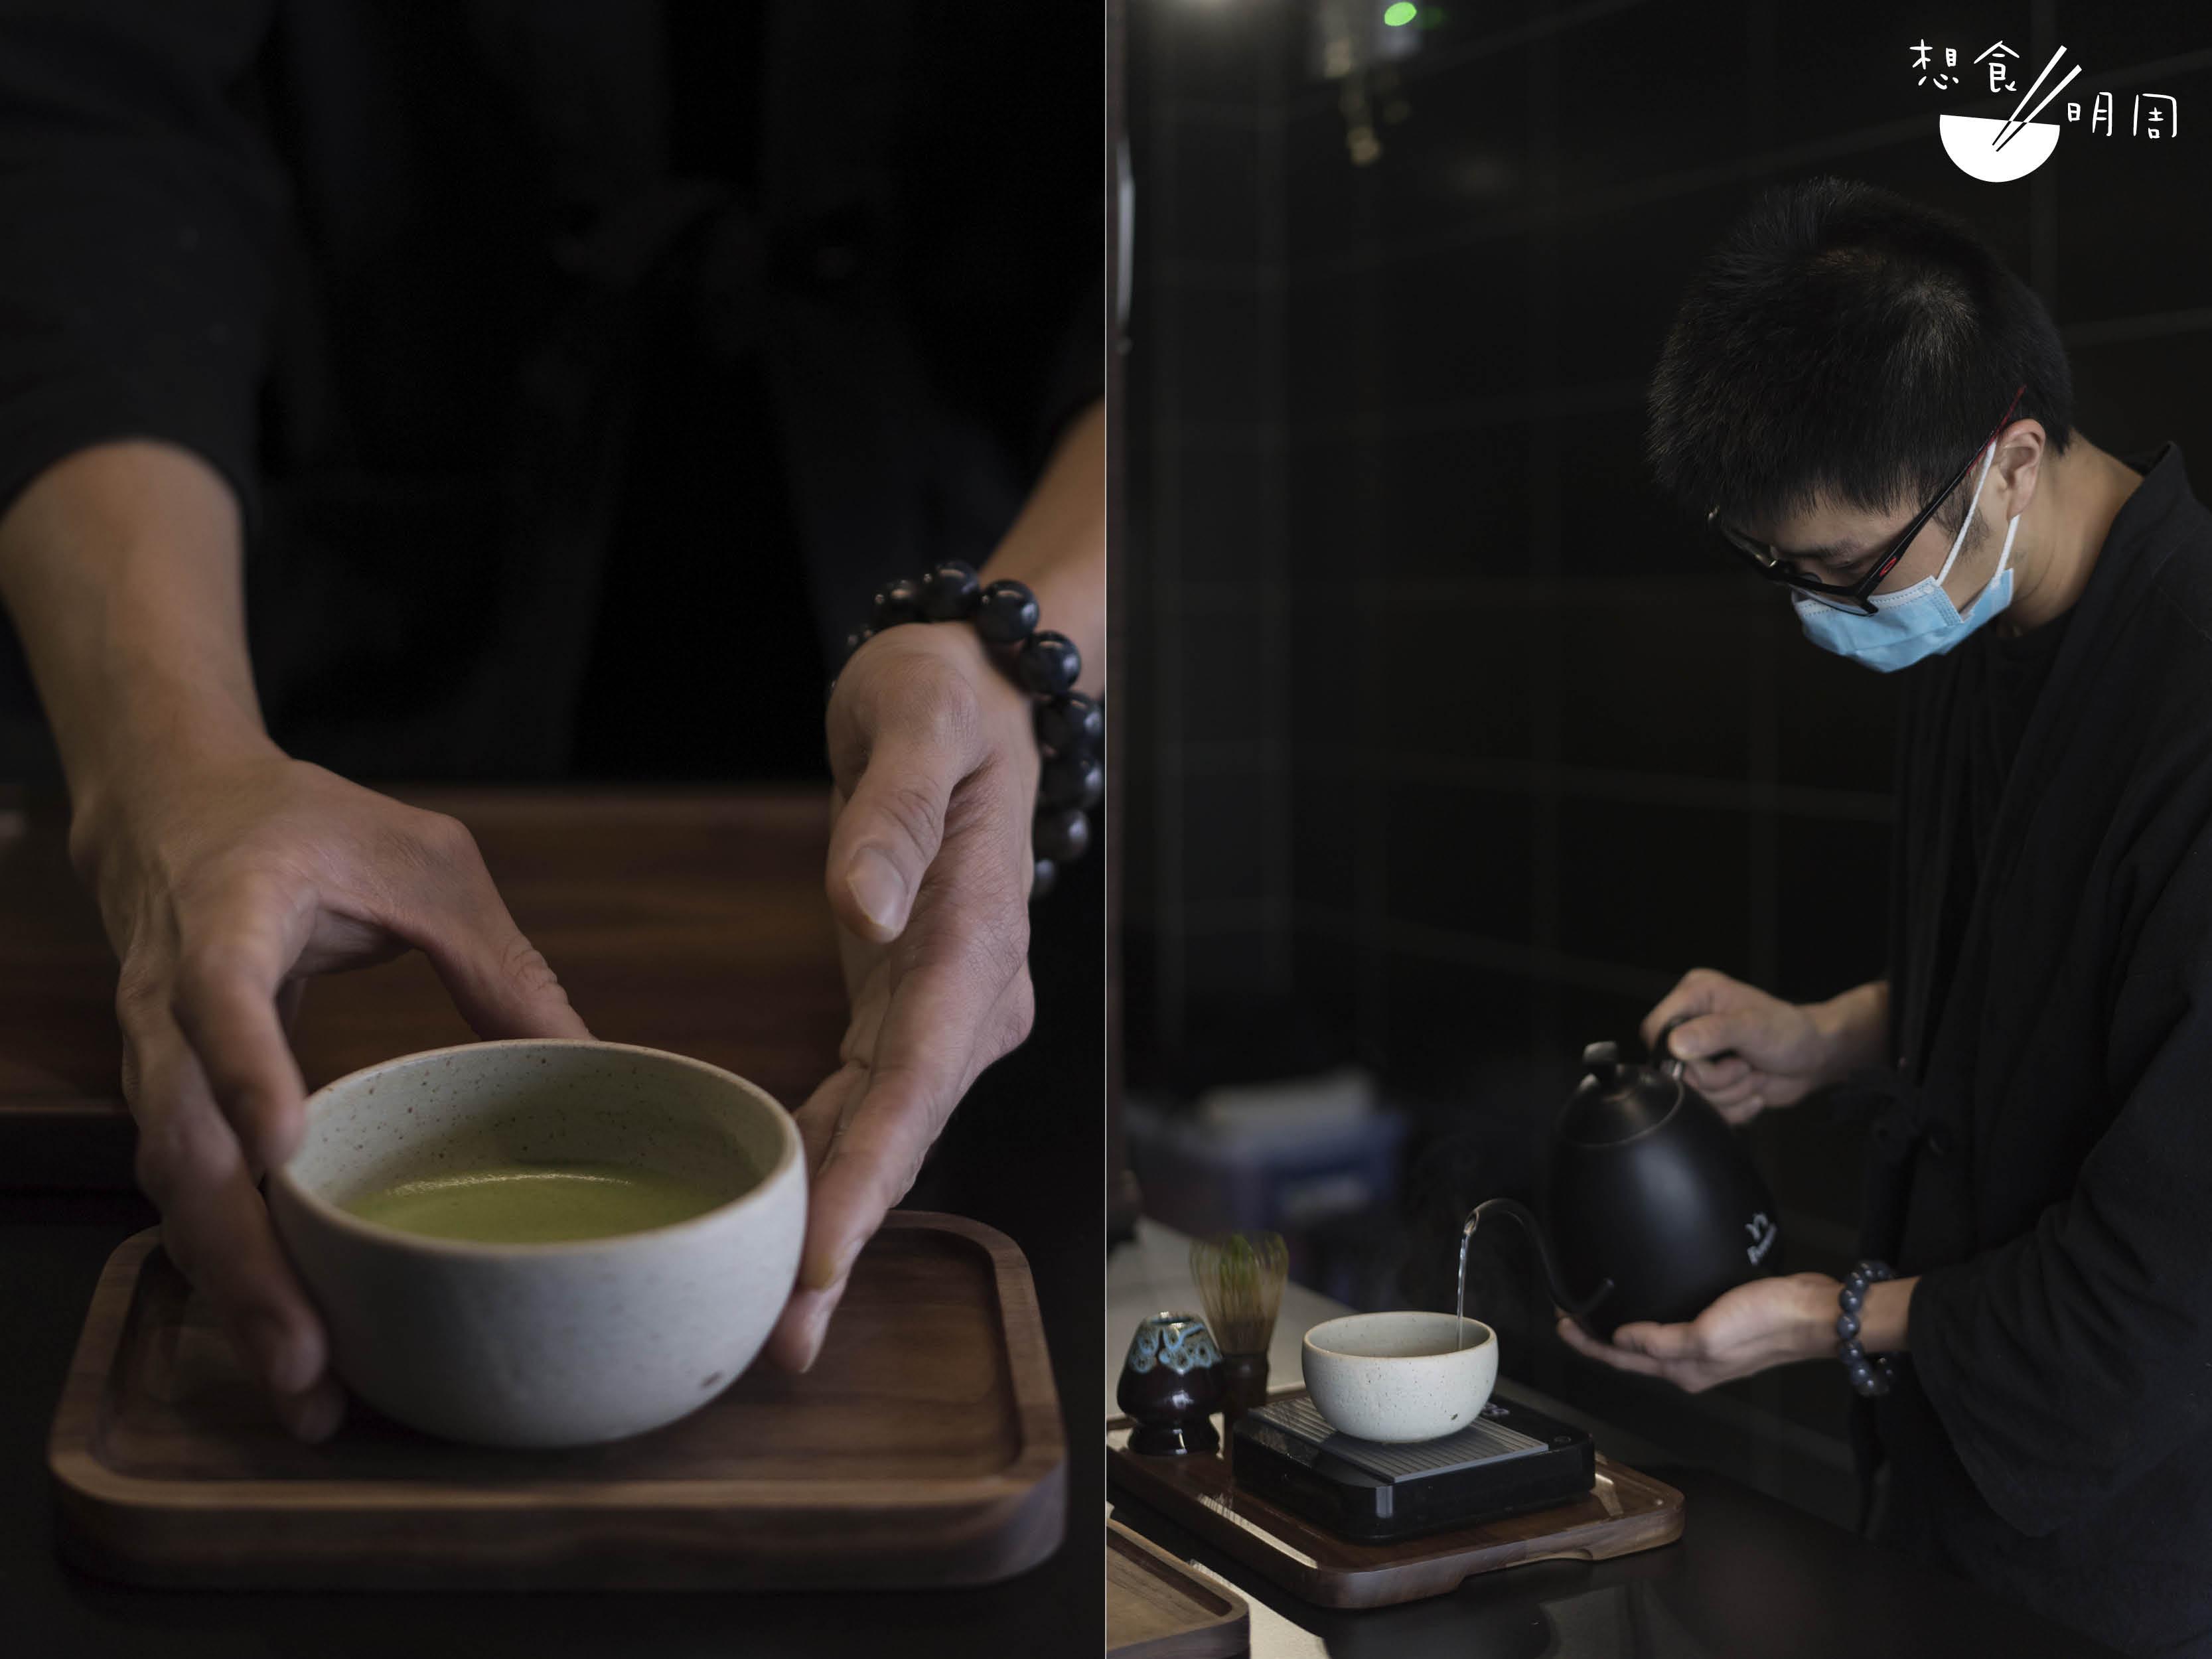 Hand-whisk Matcha 團隊試過多款茶粉後,最後選出日本小山園的這一款,偏重鮮味,口味溫和,平易近人。觀看茶師搖動茶筅轉圈打茶後,再以雙手捧着陶藝茶碗飲用茶湯,感受店主所說的一期一會。($75)